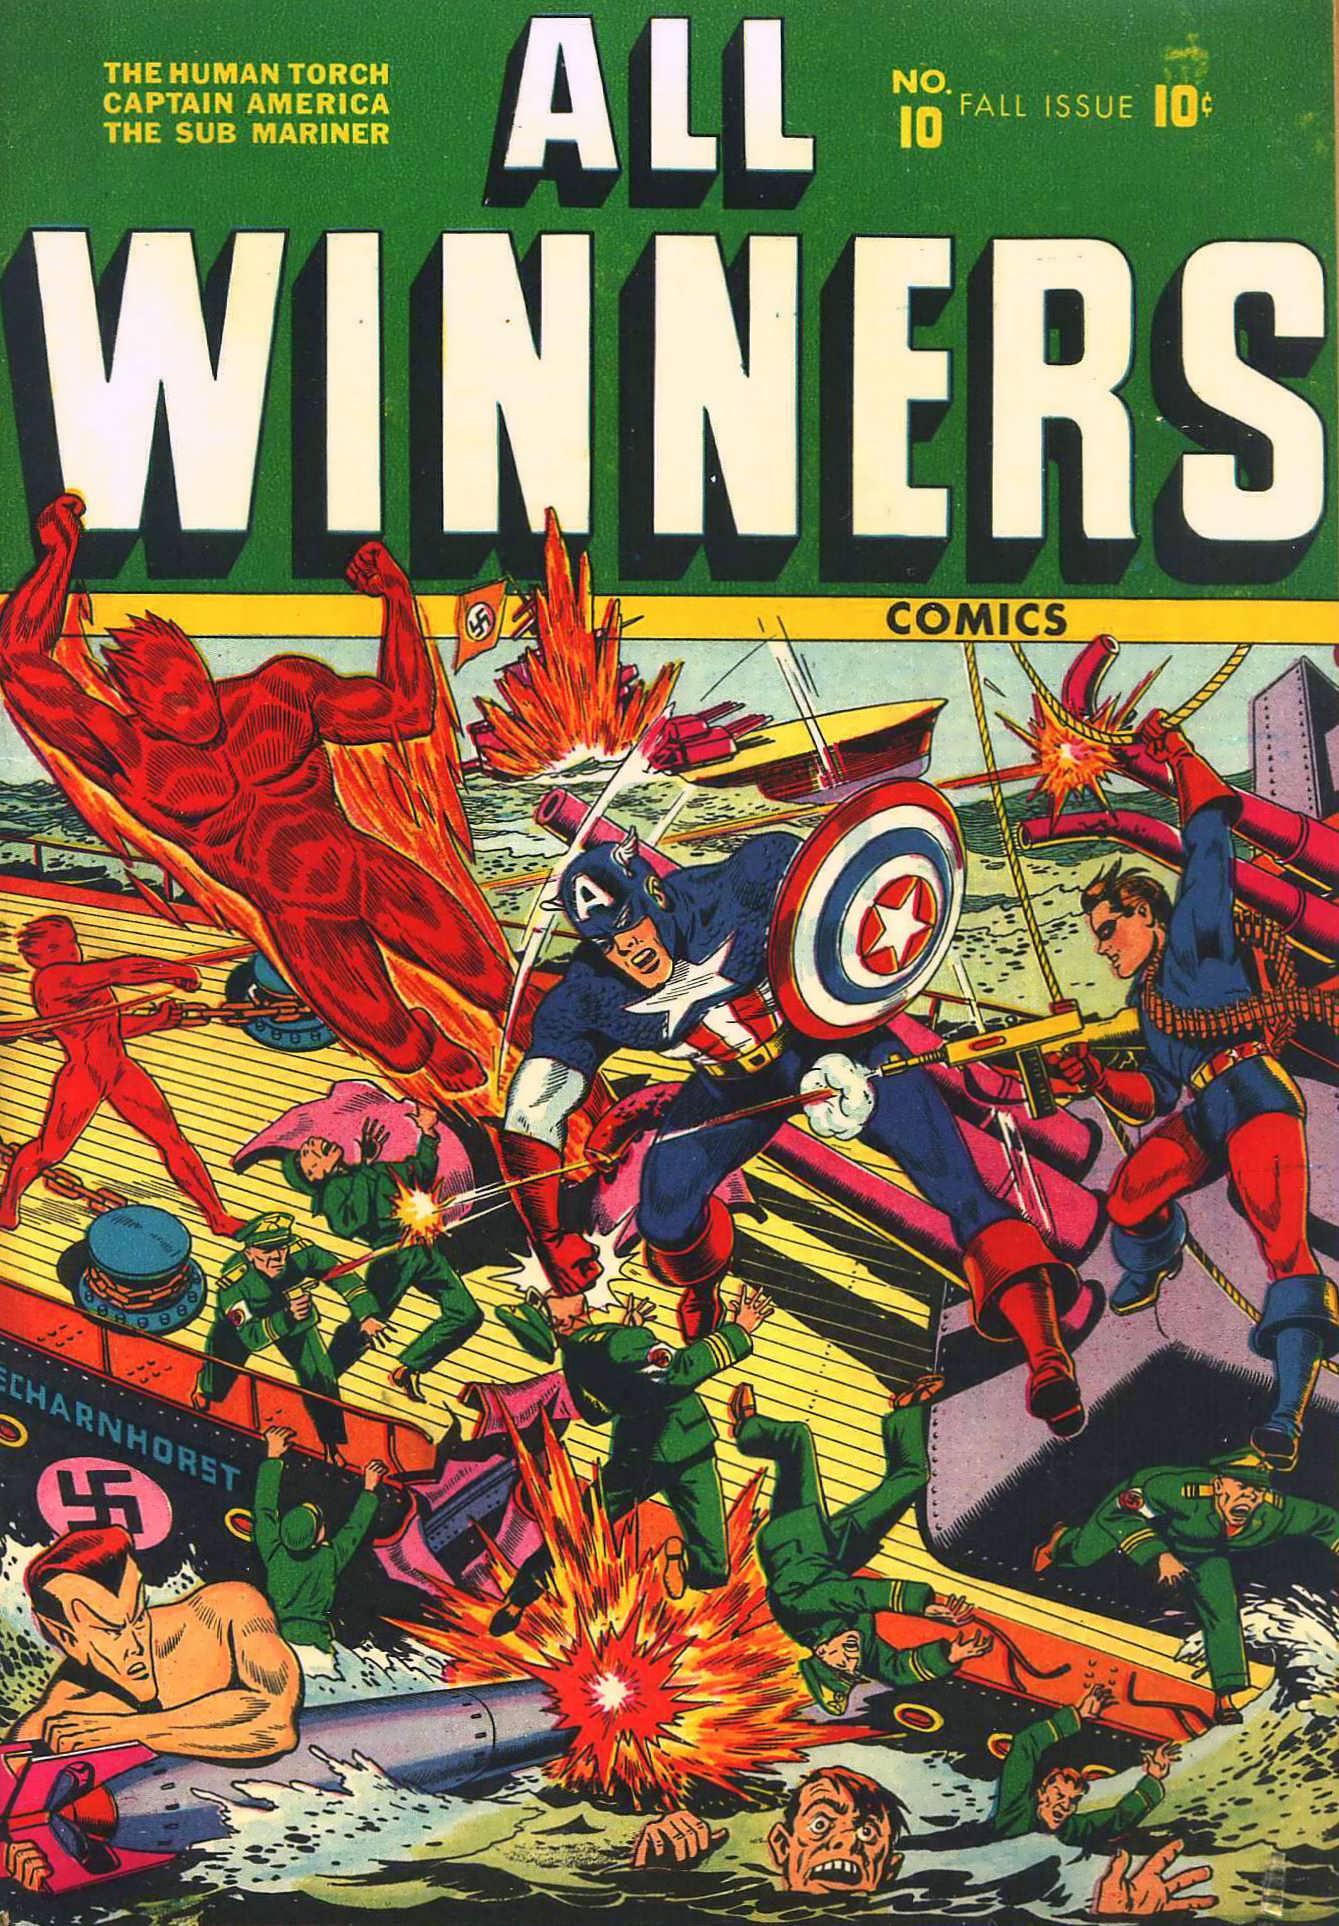 All-Winners Comics 10 Page 1